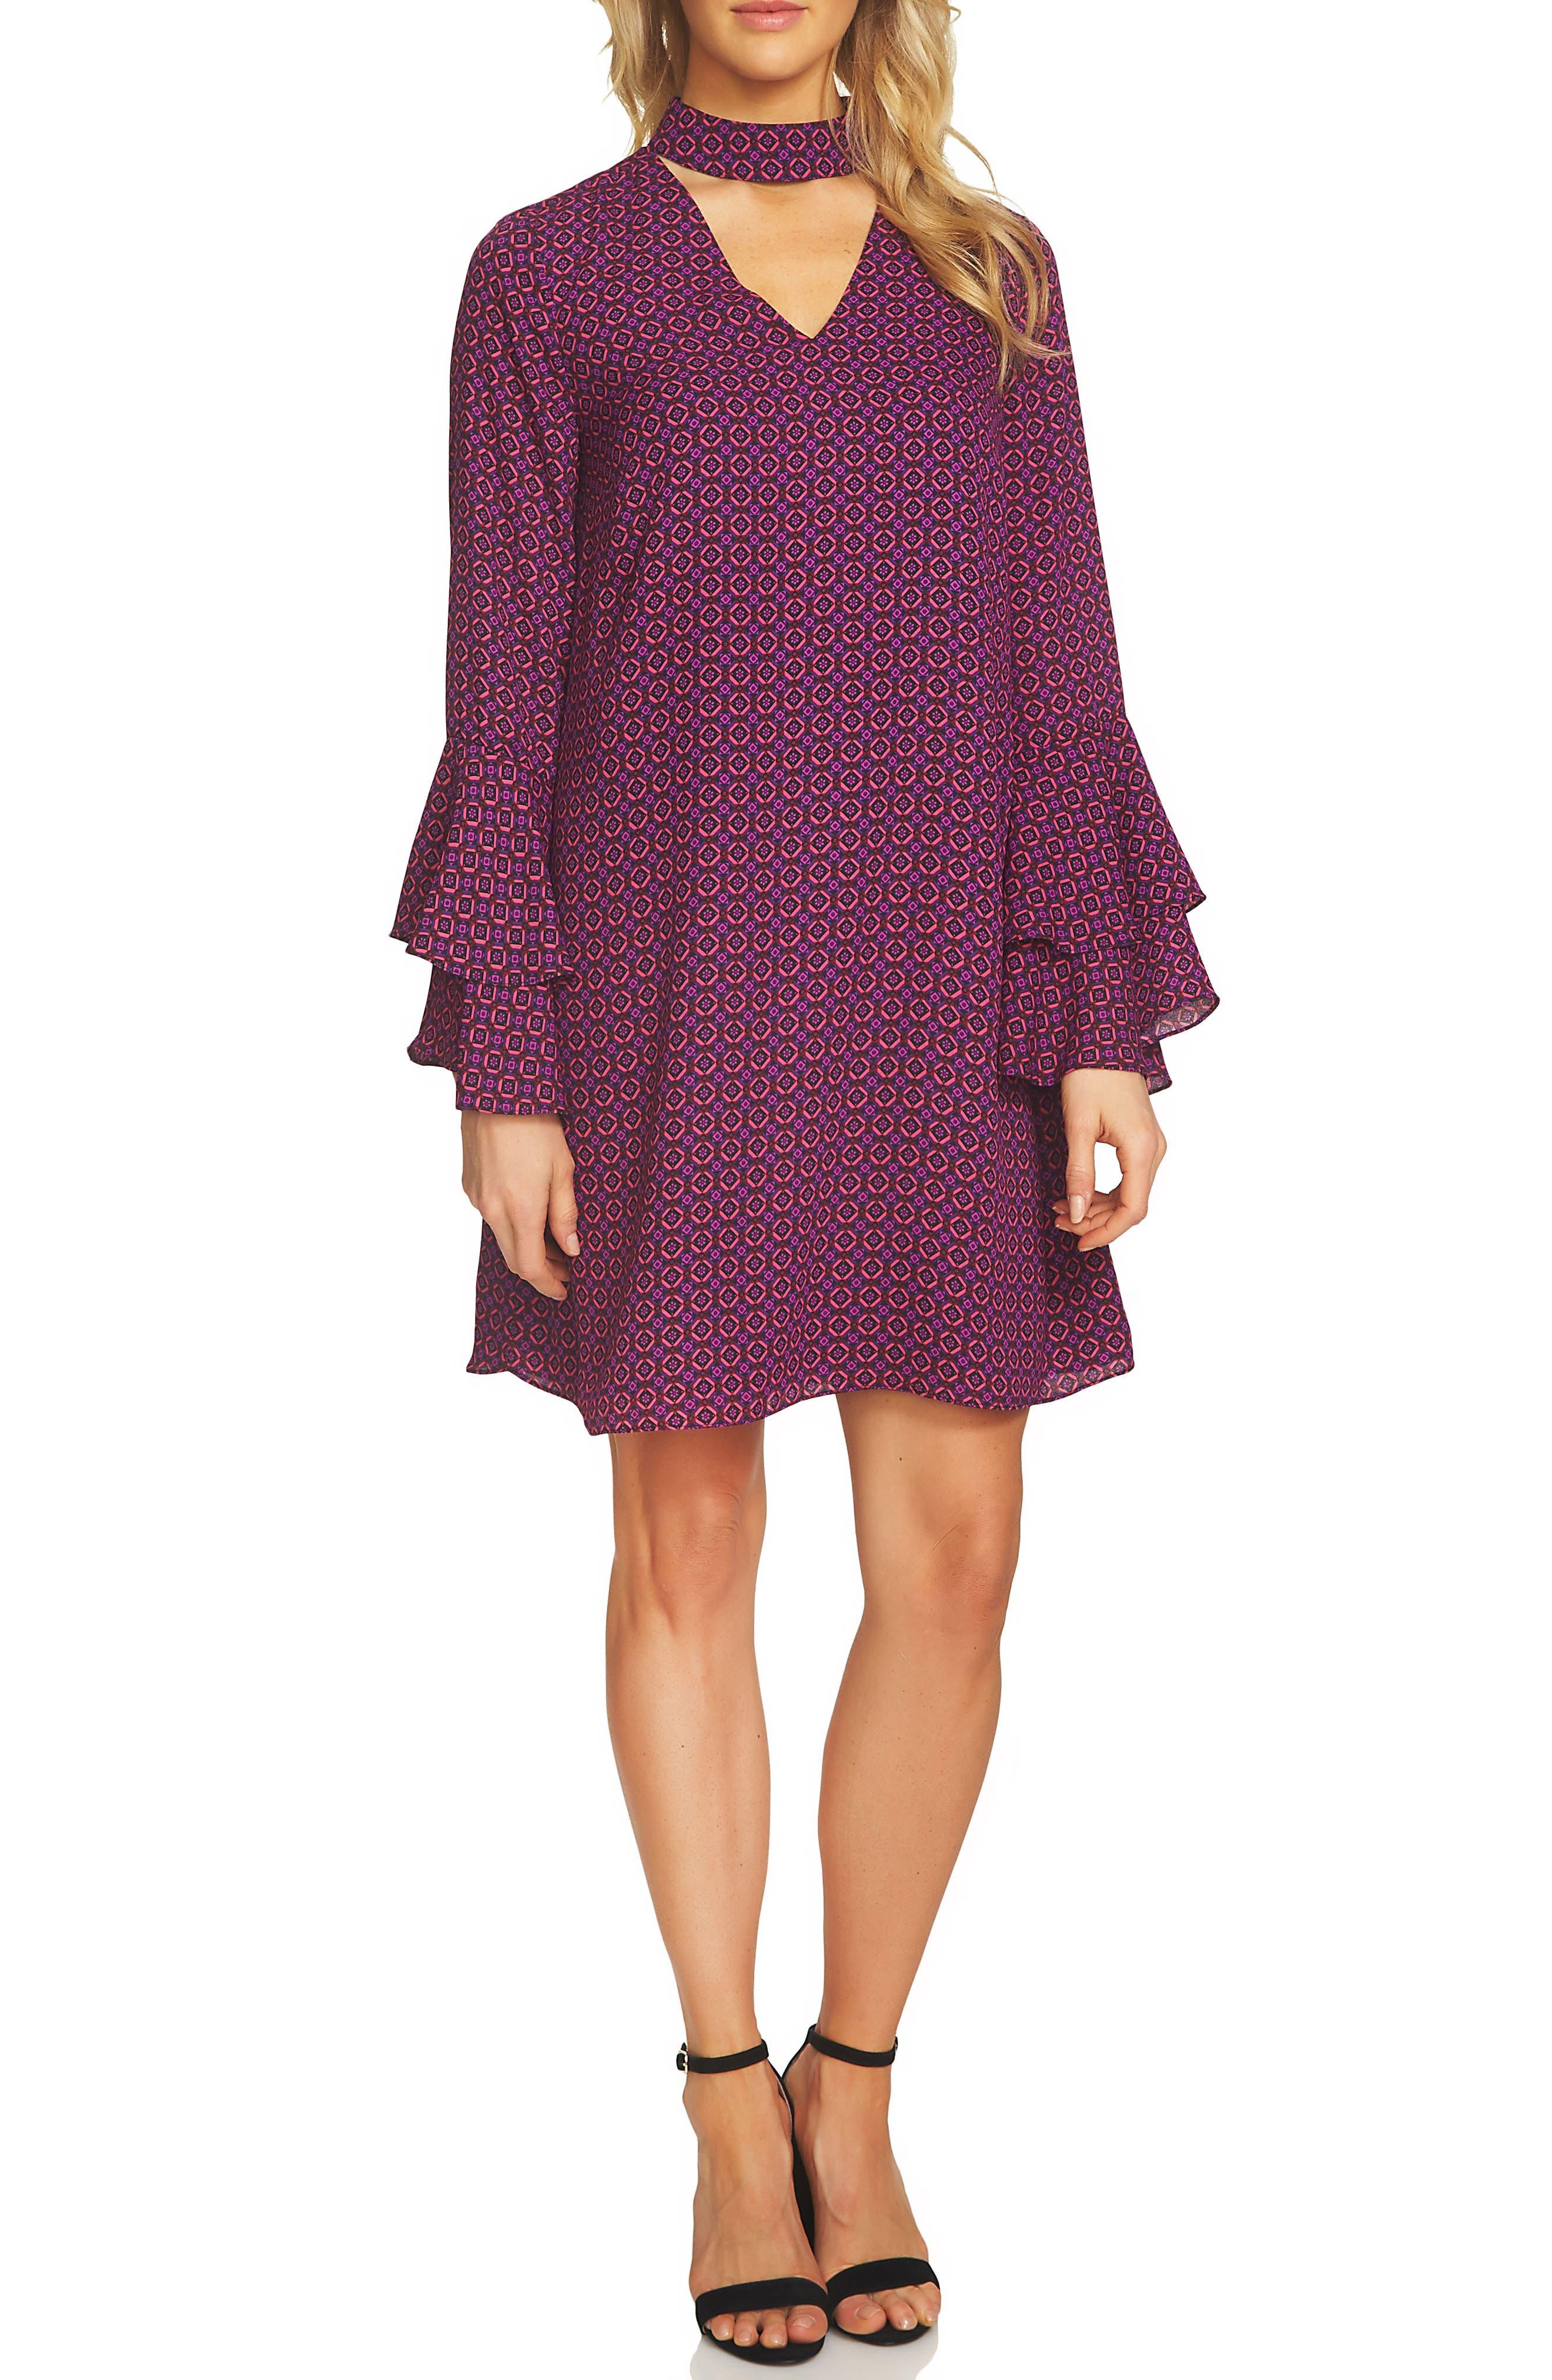 Choker Bell Sleeve Dress,                         Main,                         color, Vibrant Cerise